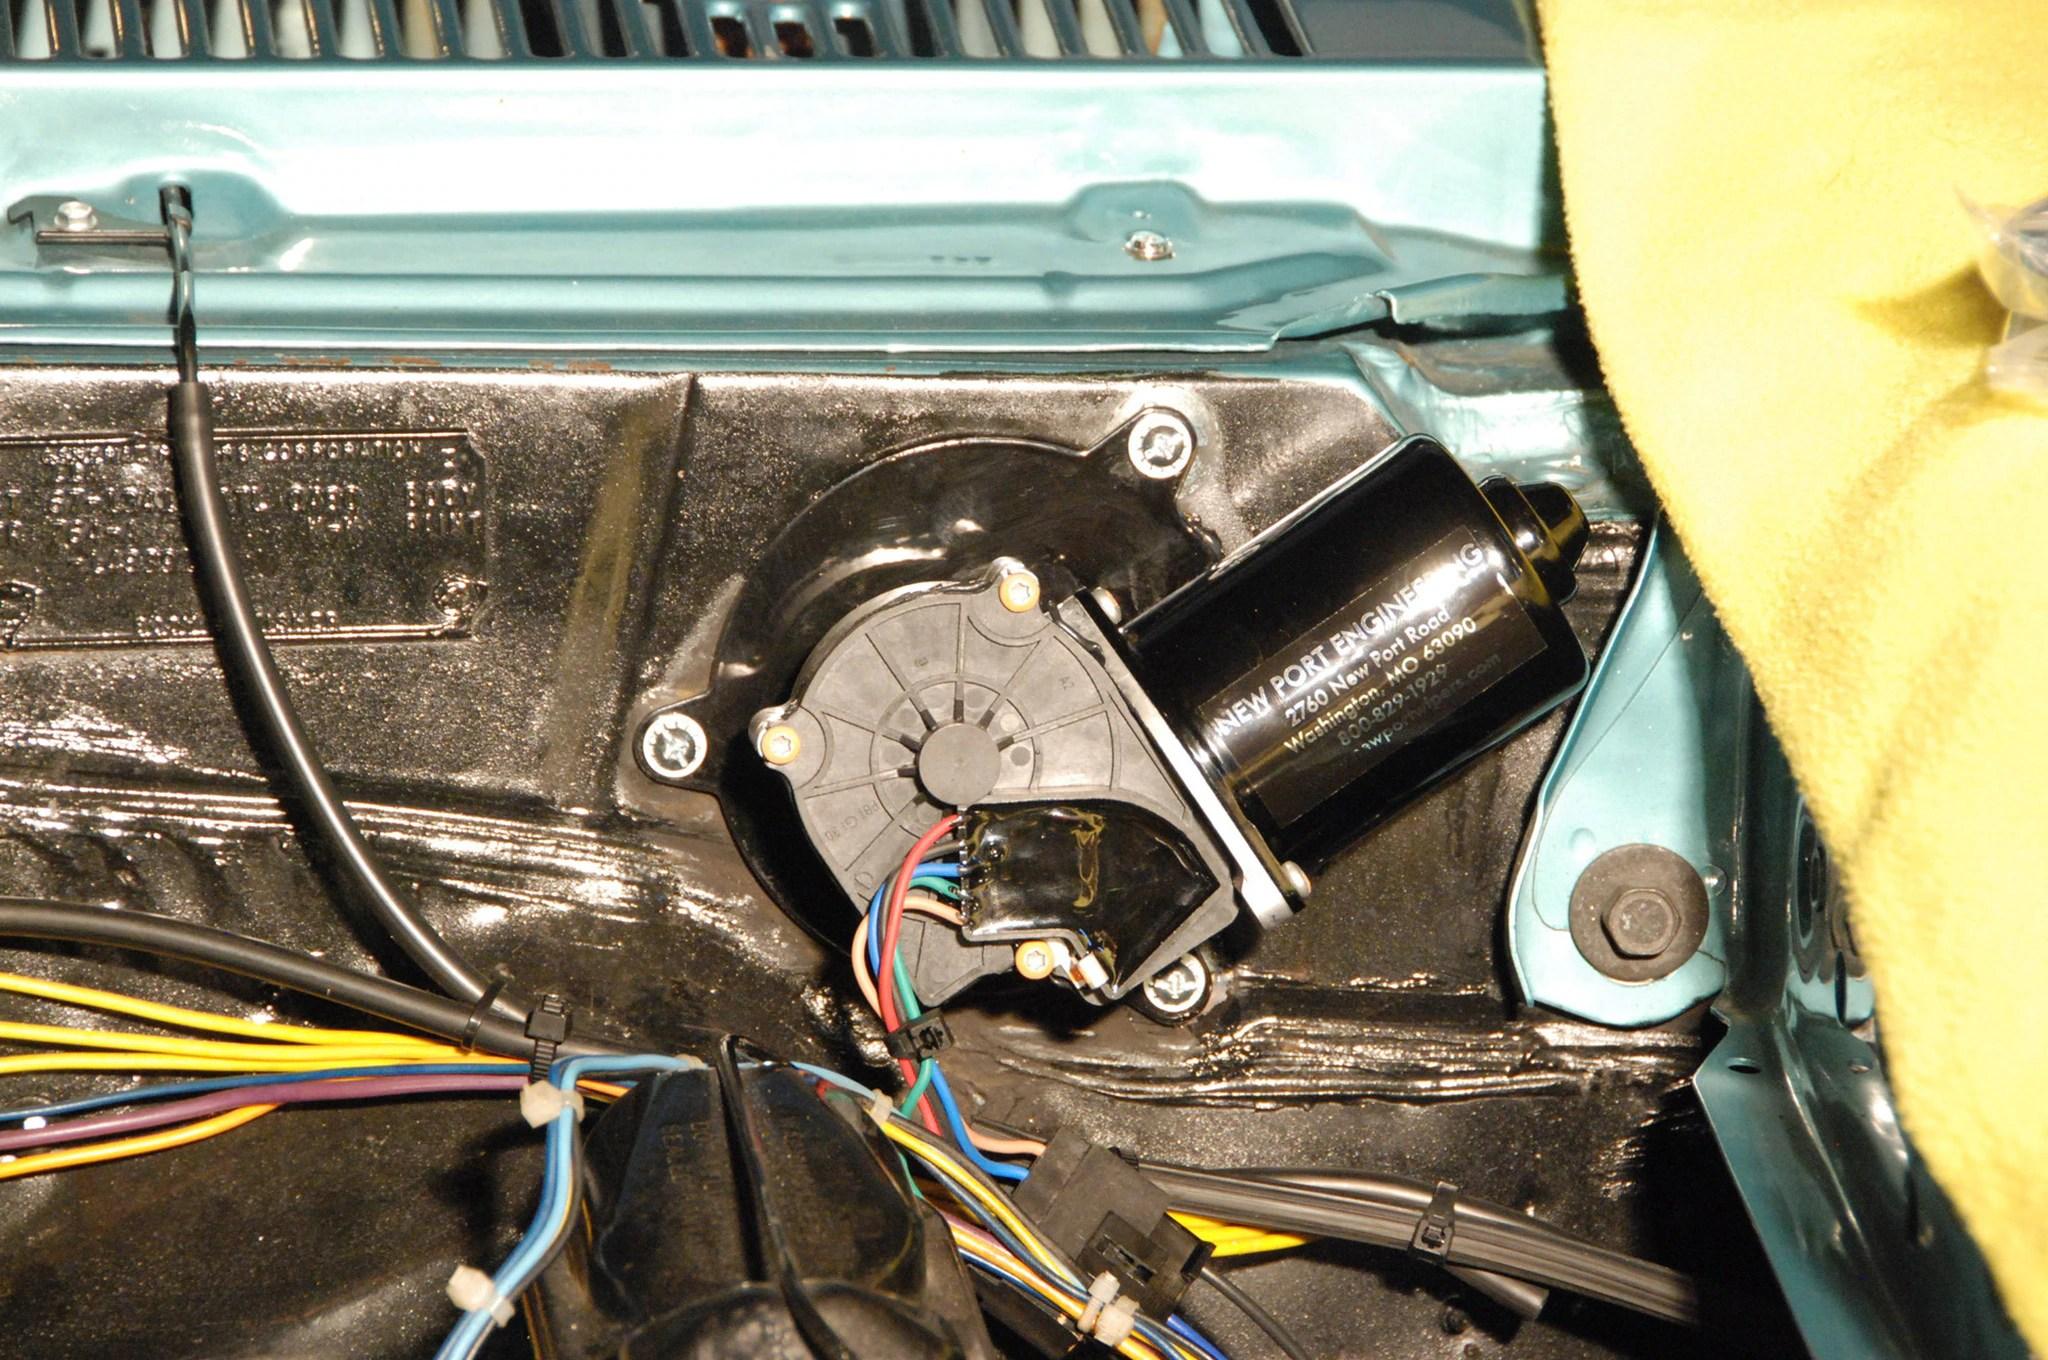 hight resolution of 1966 chevelle windshield wiper washer wiring diagram little wiring 1990 chevy windshield wiper wiring 1966 chevelle windshield wiper washer wiring diagram